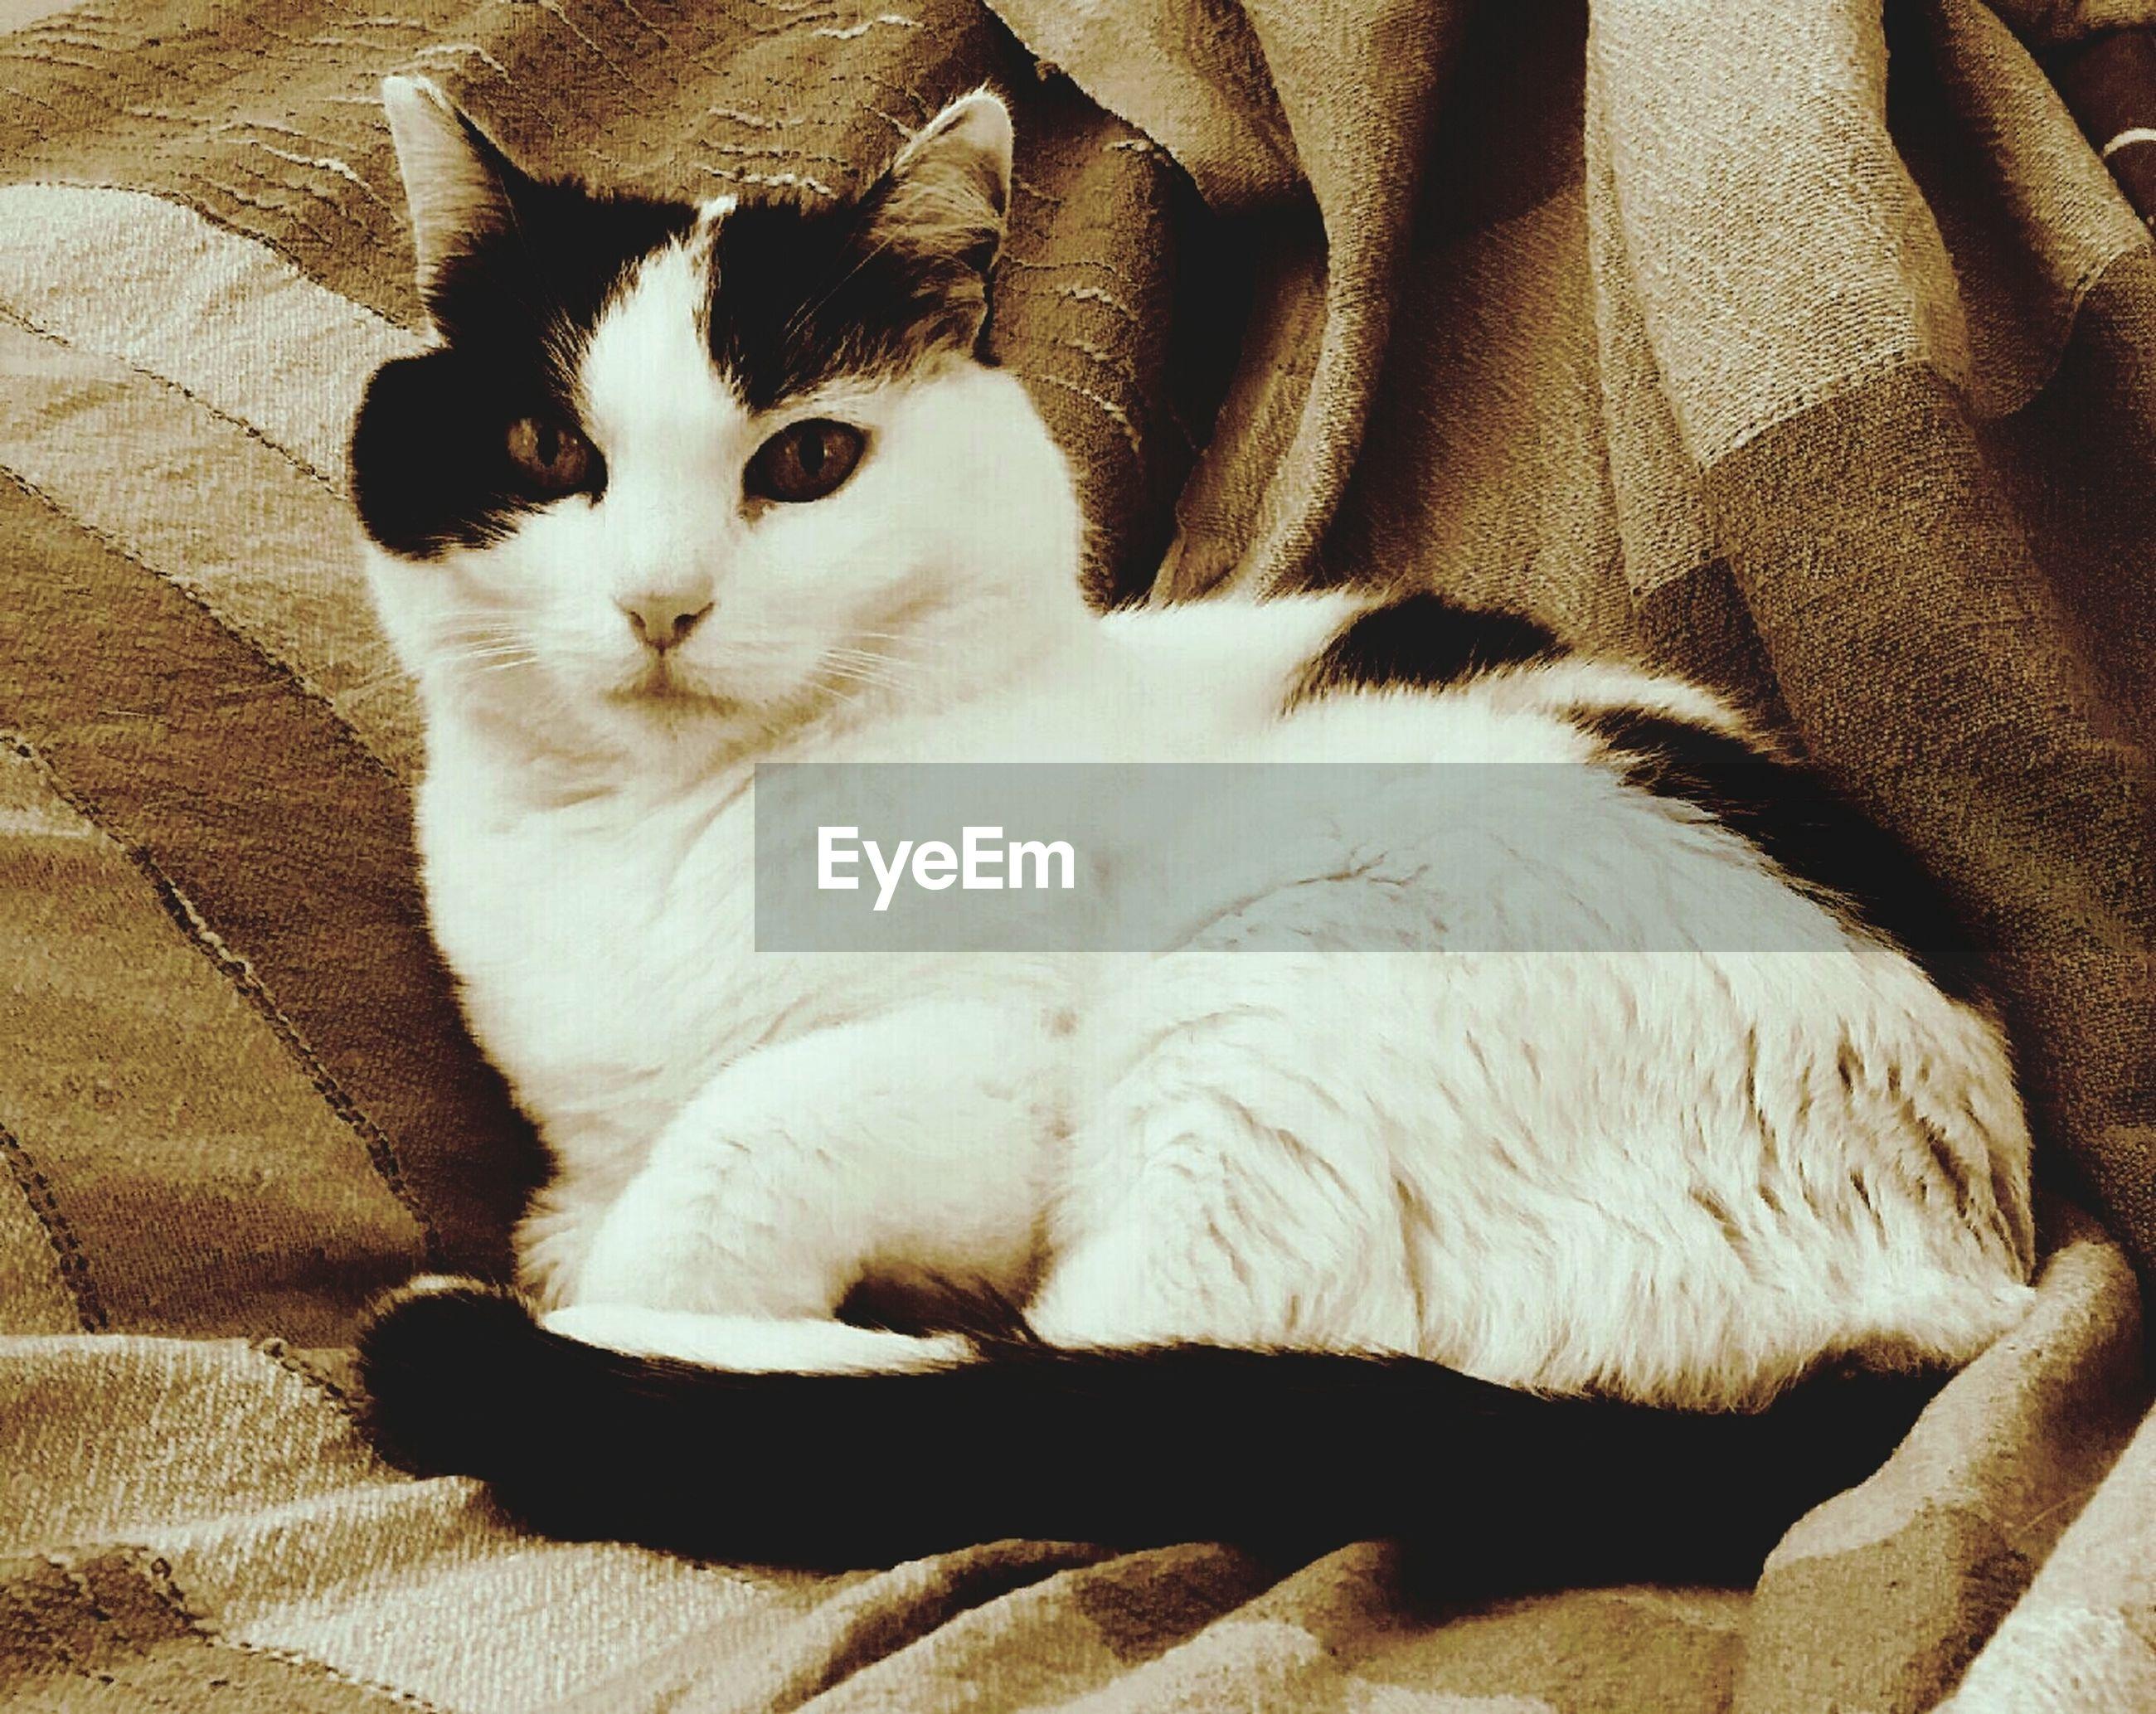 Cat lying in blanket